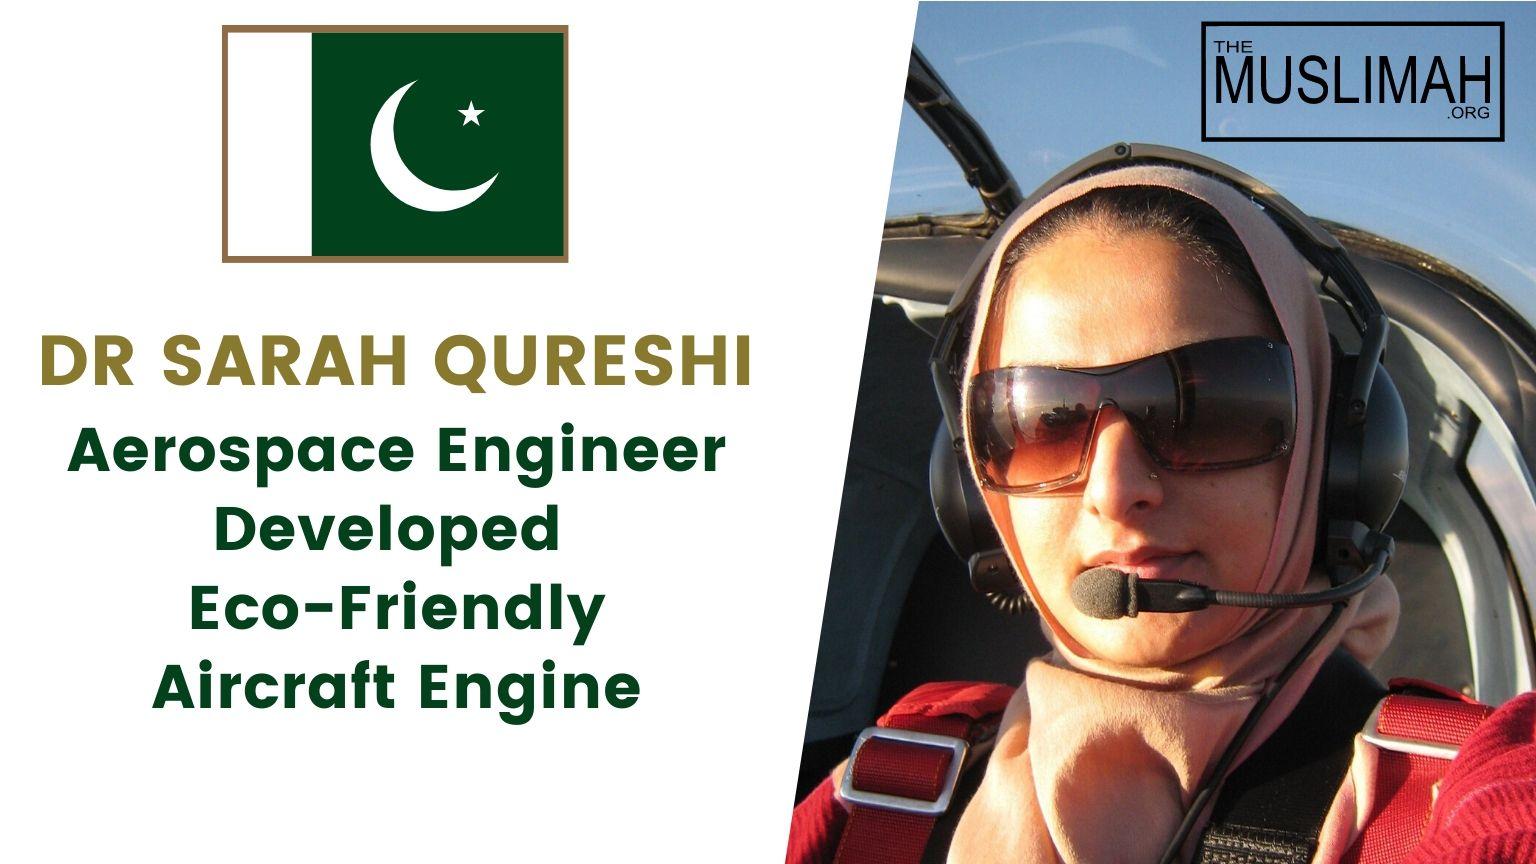 Dr Sarah Qureshi 🇵🇰 Pakistani Aerospace Engineer Aims To Make Air Travel Sustainable